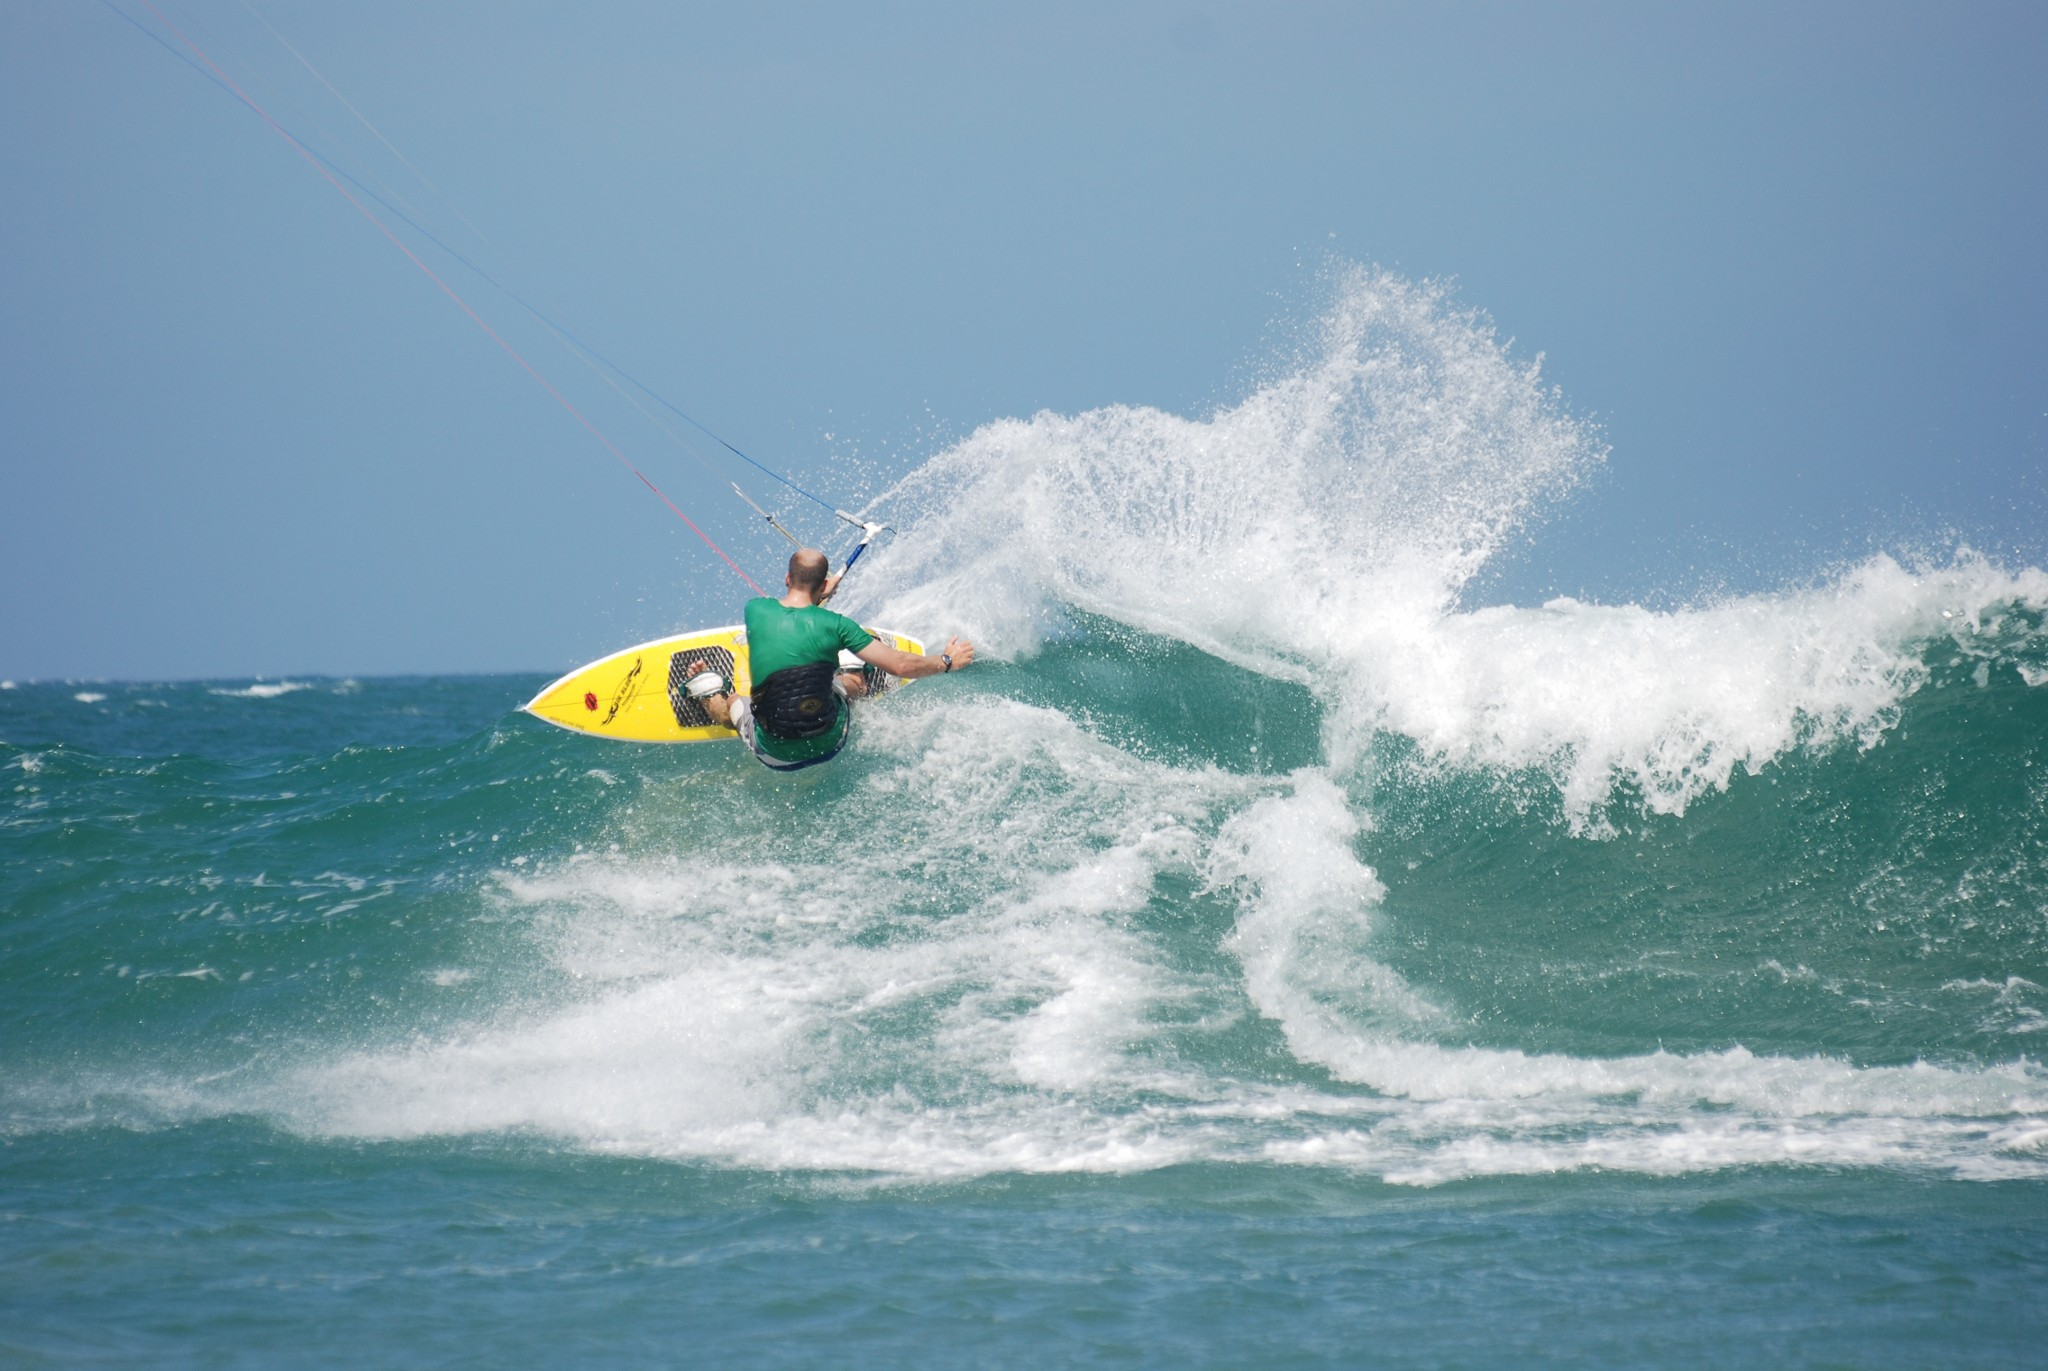 Kitesurfing lesson- waveriding